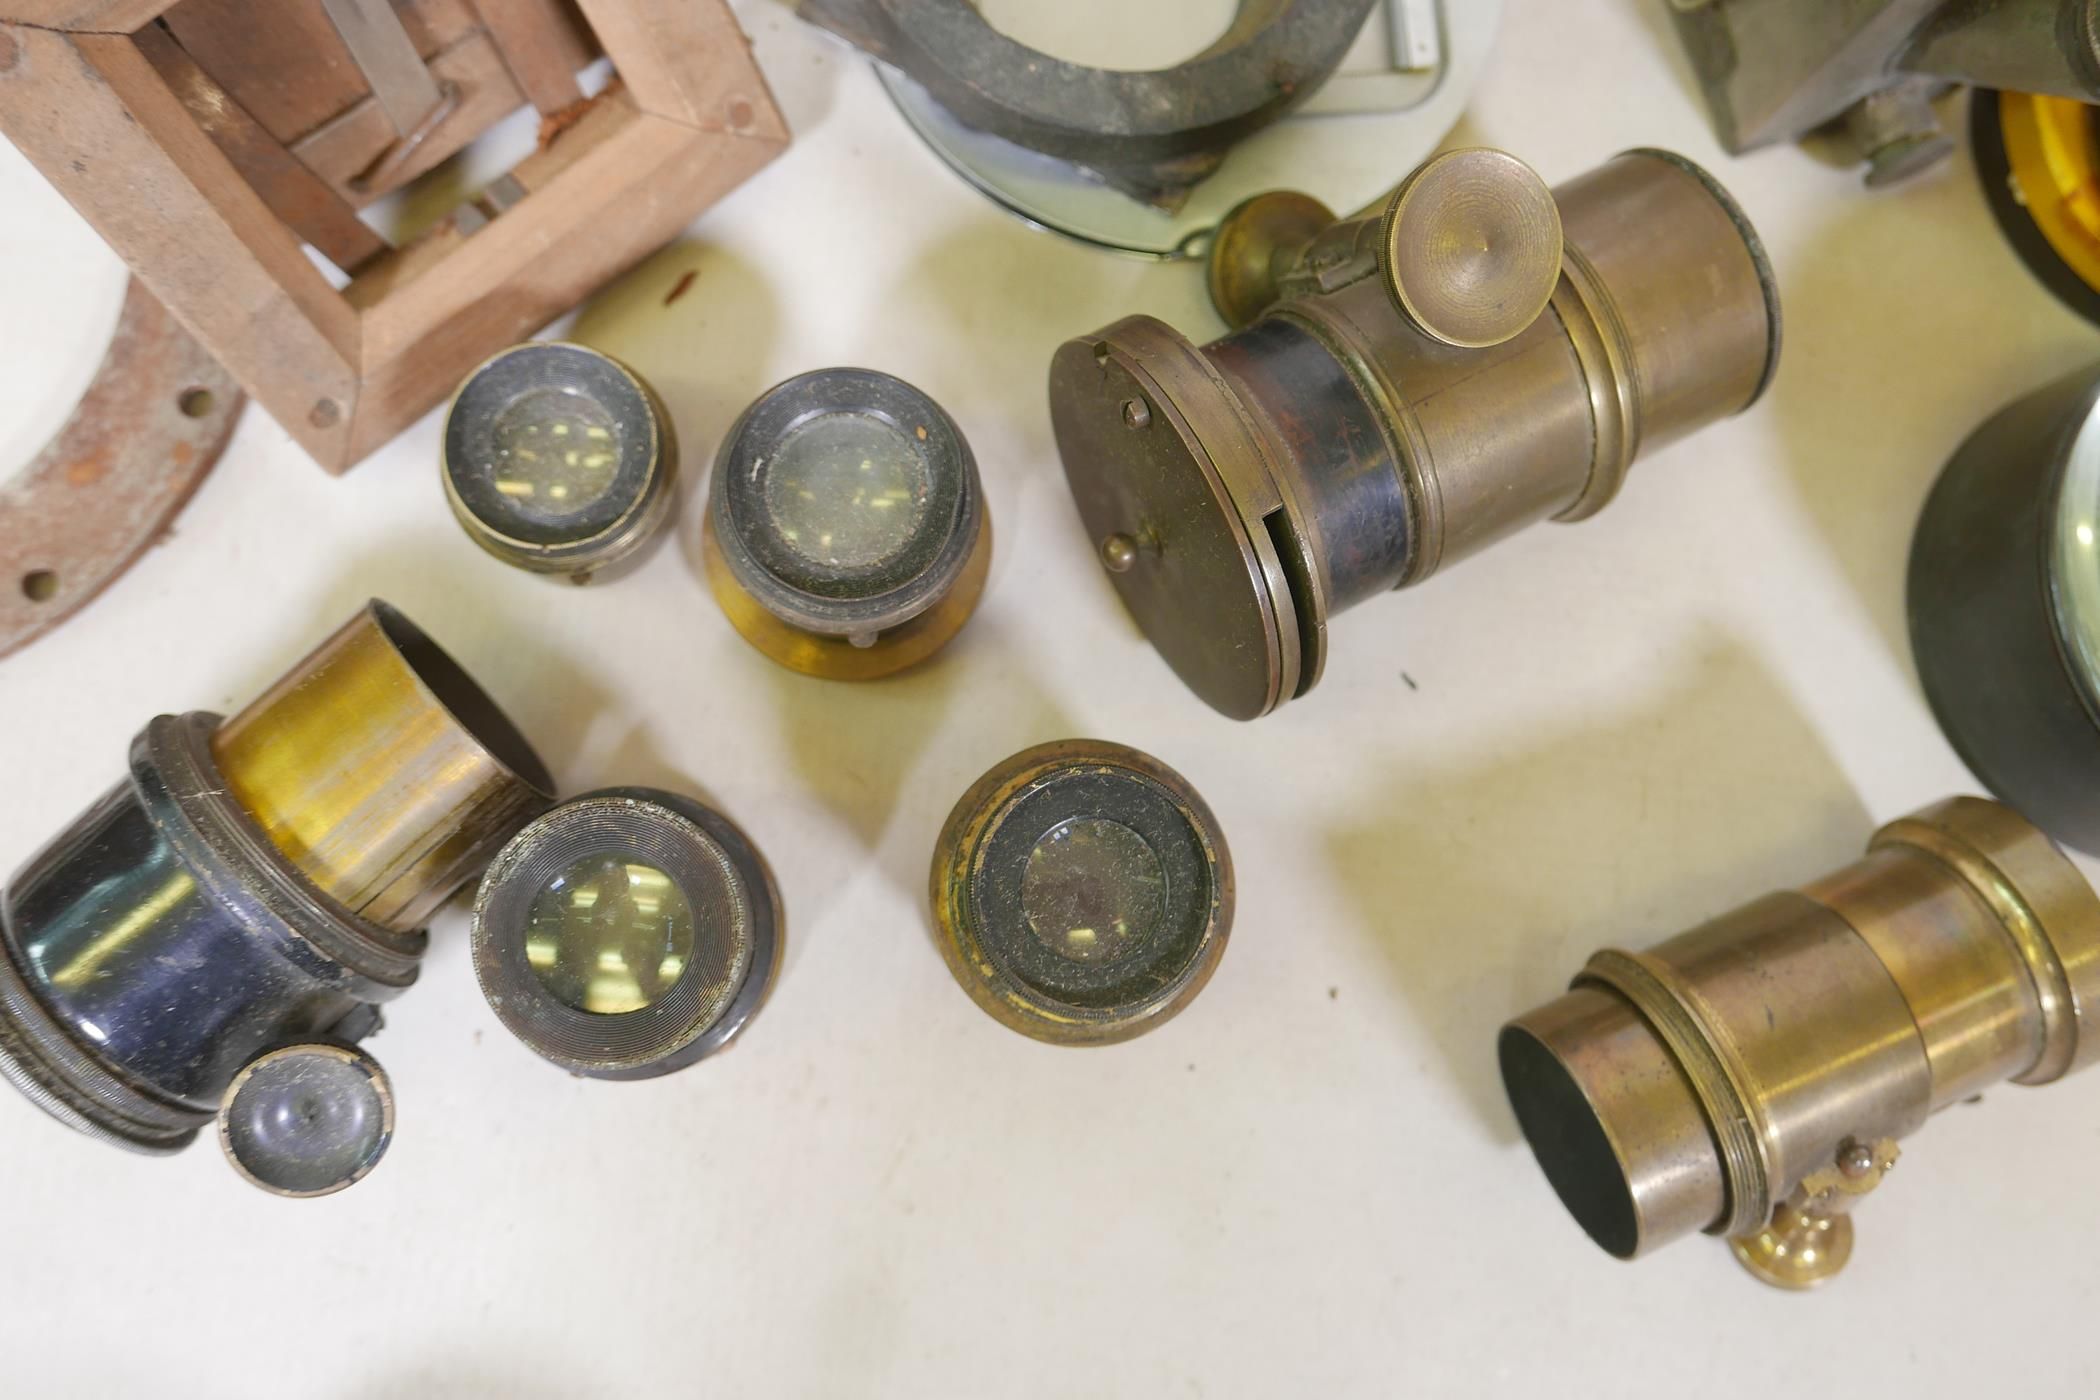 A quantity of antique photography equipment, Engsign Klito, Kodak Duaflex, No2 Hawkeye Model B, - Image 4 of 12